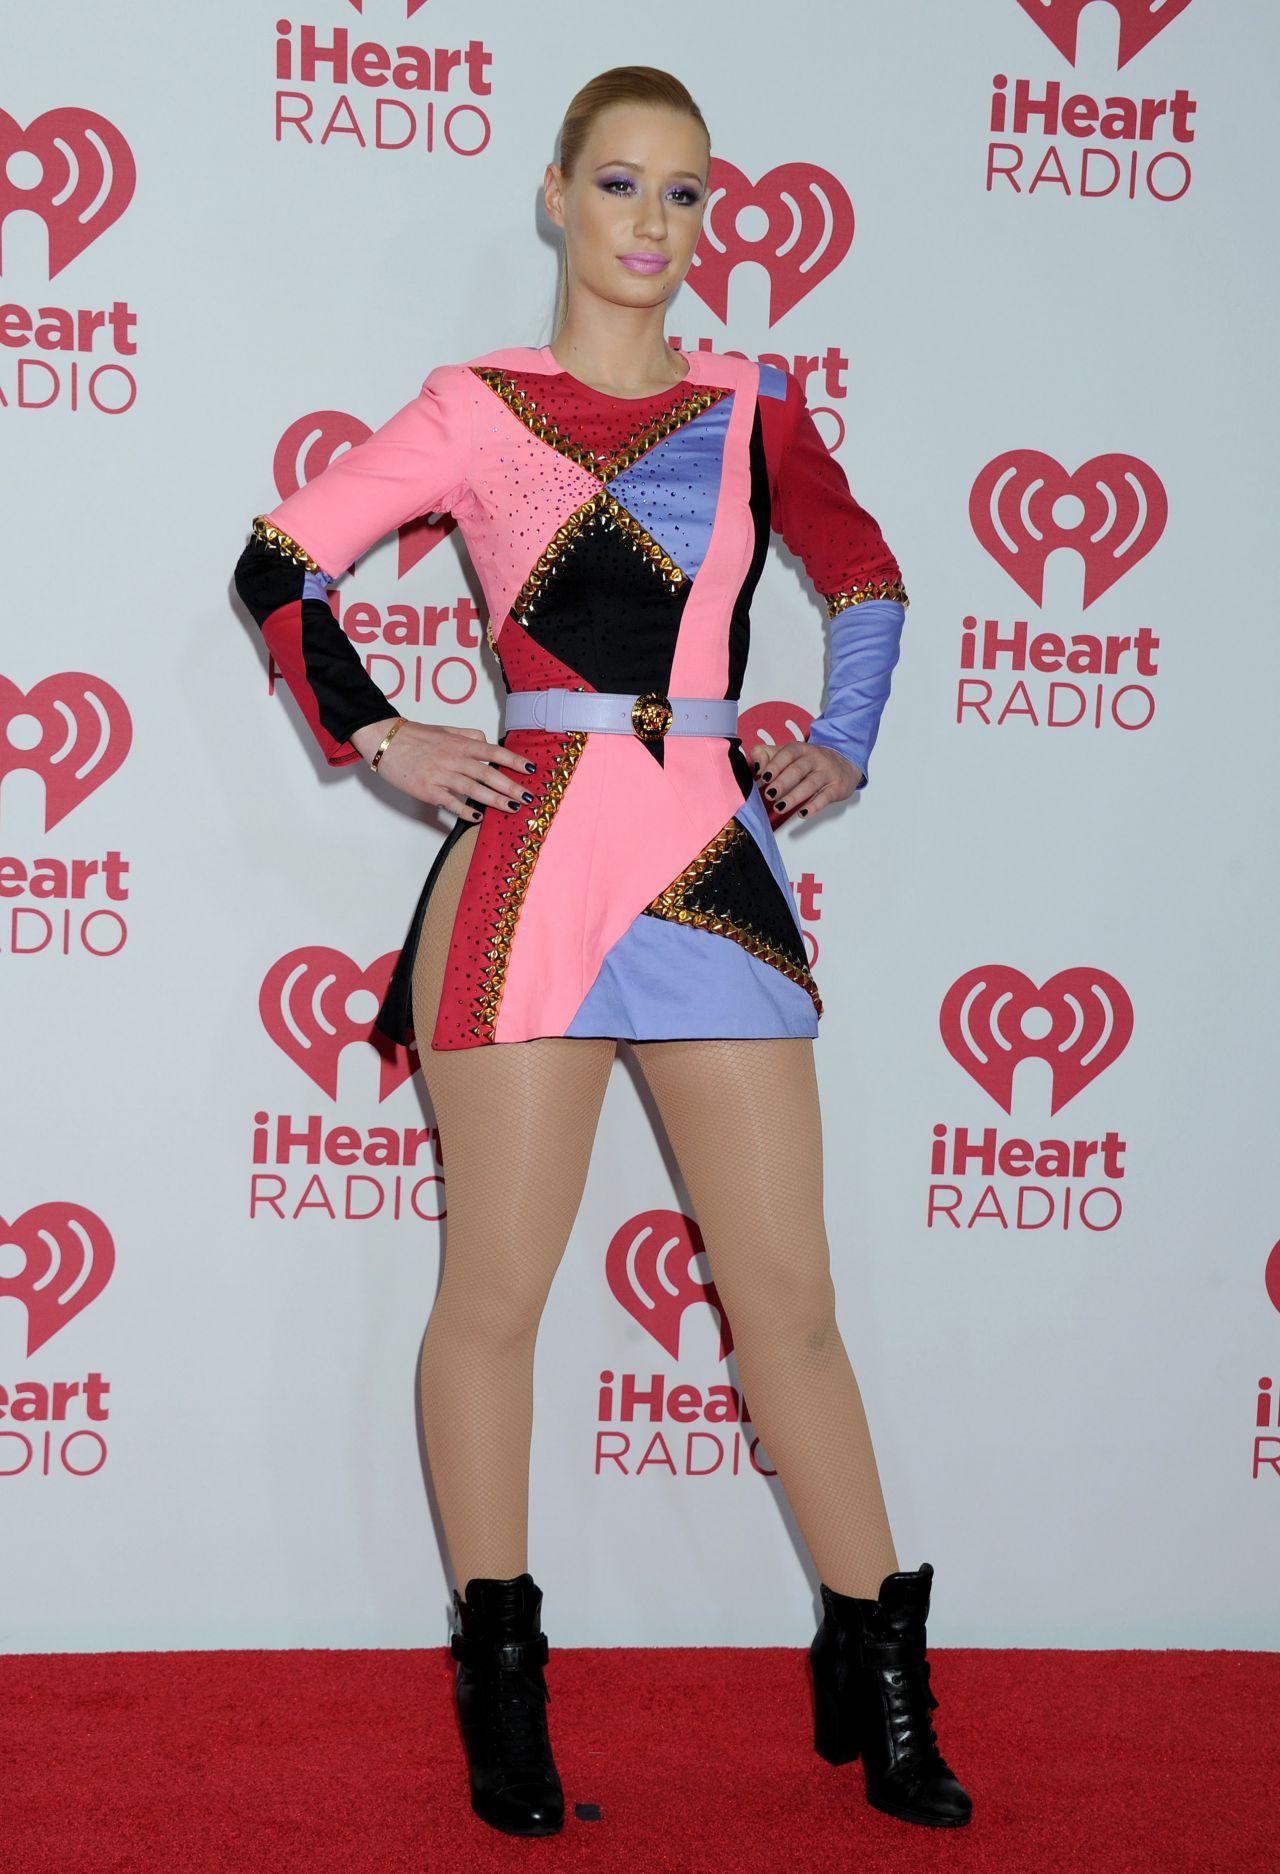 Iggy Azalea - iHeartRadio Music Festival Night 2 in Las Vegas